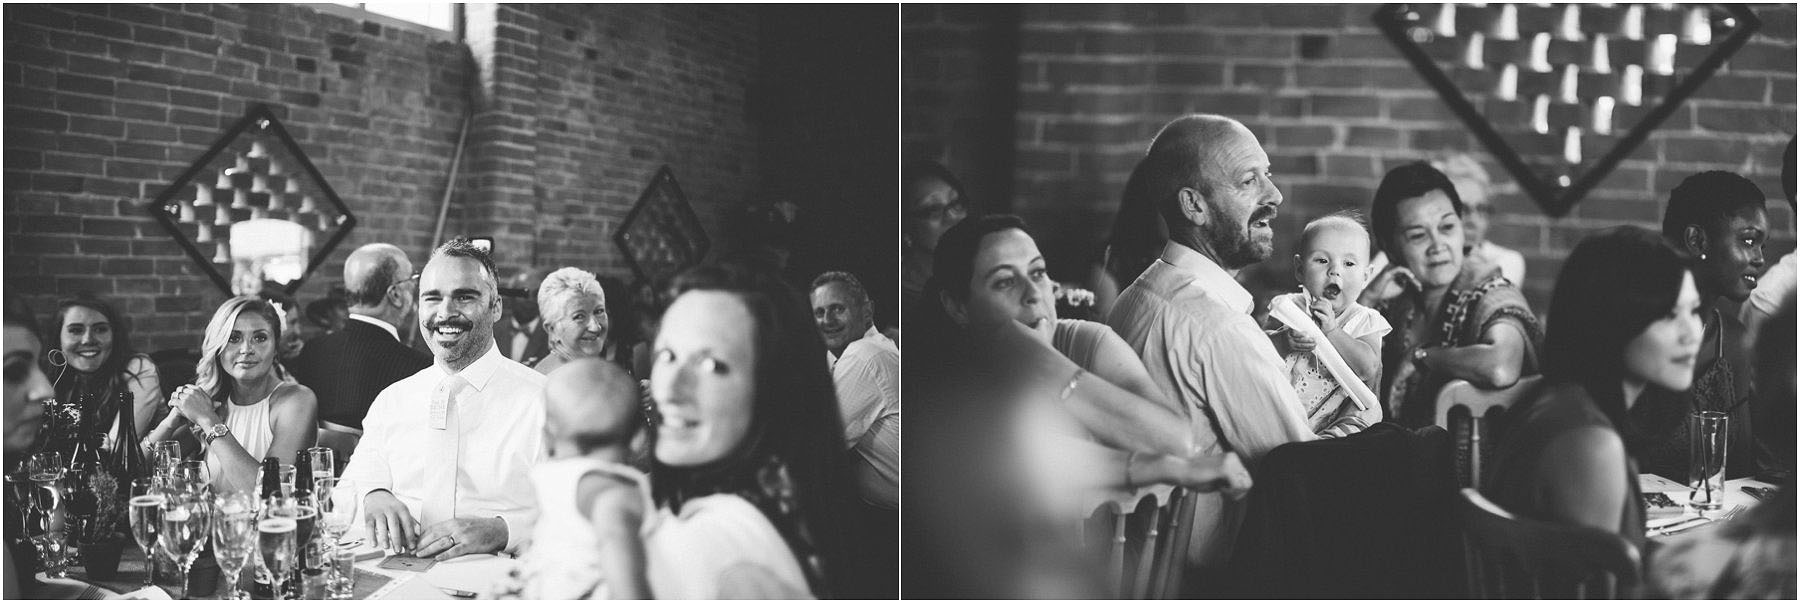 Swallows_Nest_Barn_Wedding_Photography_0145